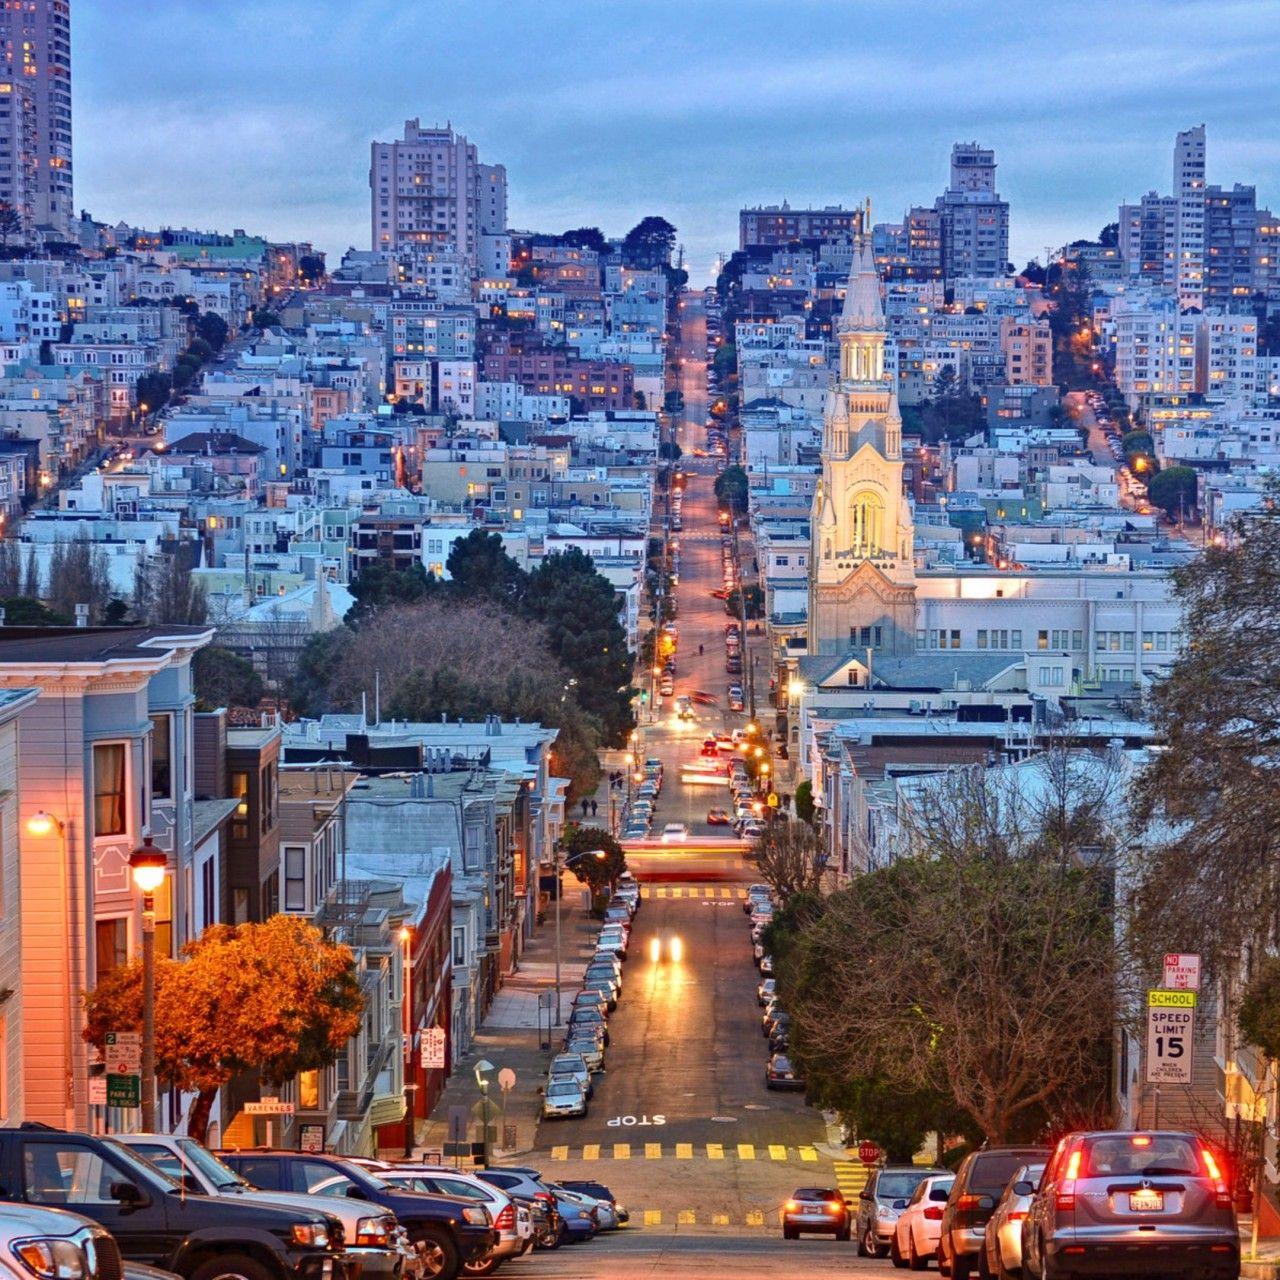 City Streets San Francisco 4K Wallpaper Free 4K